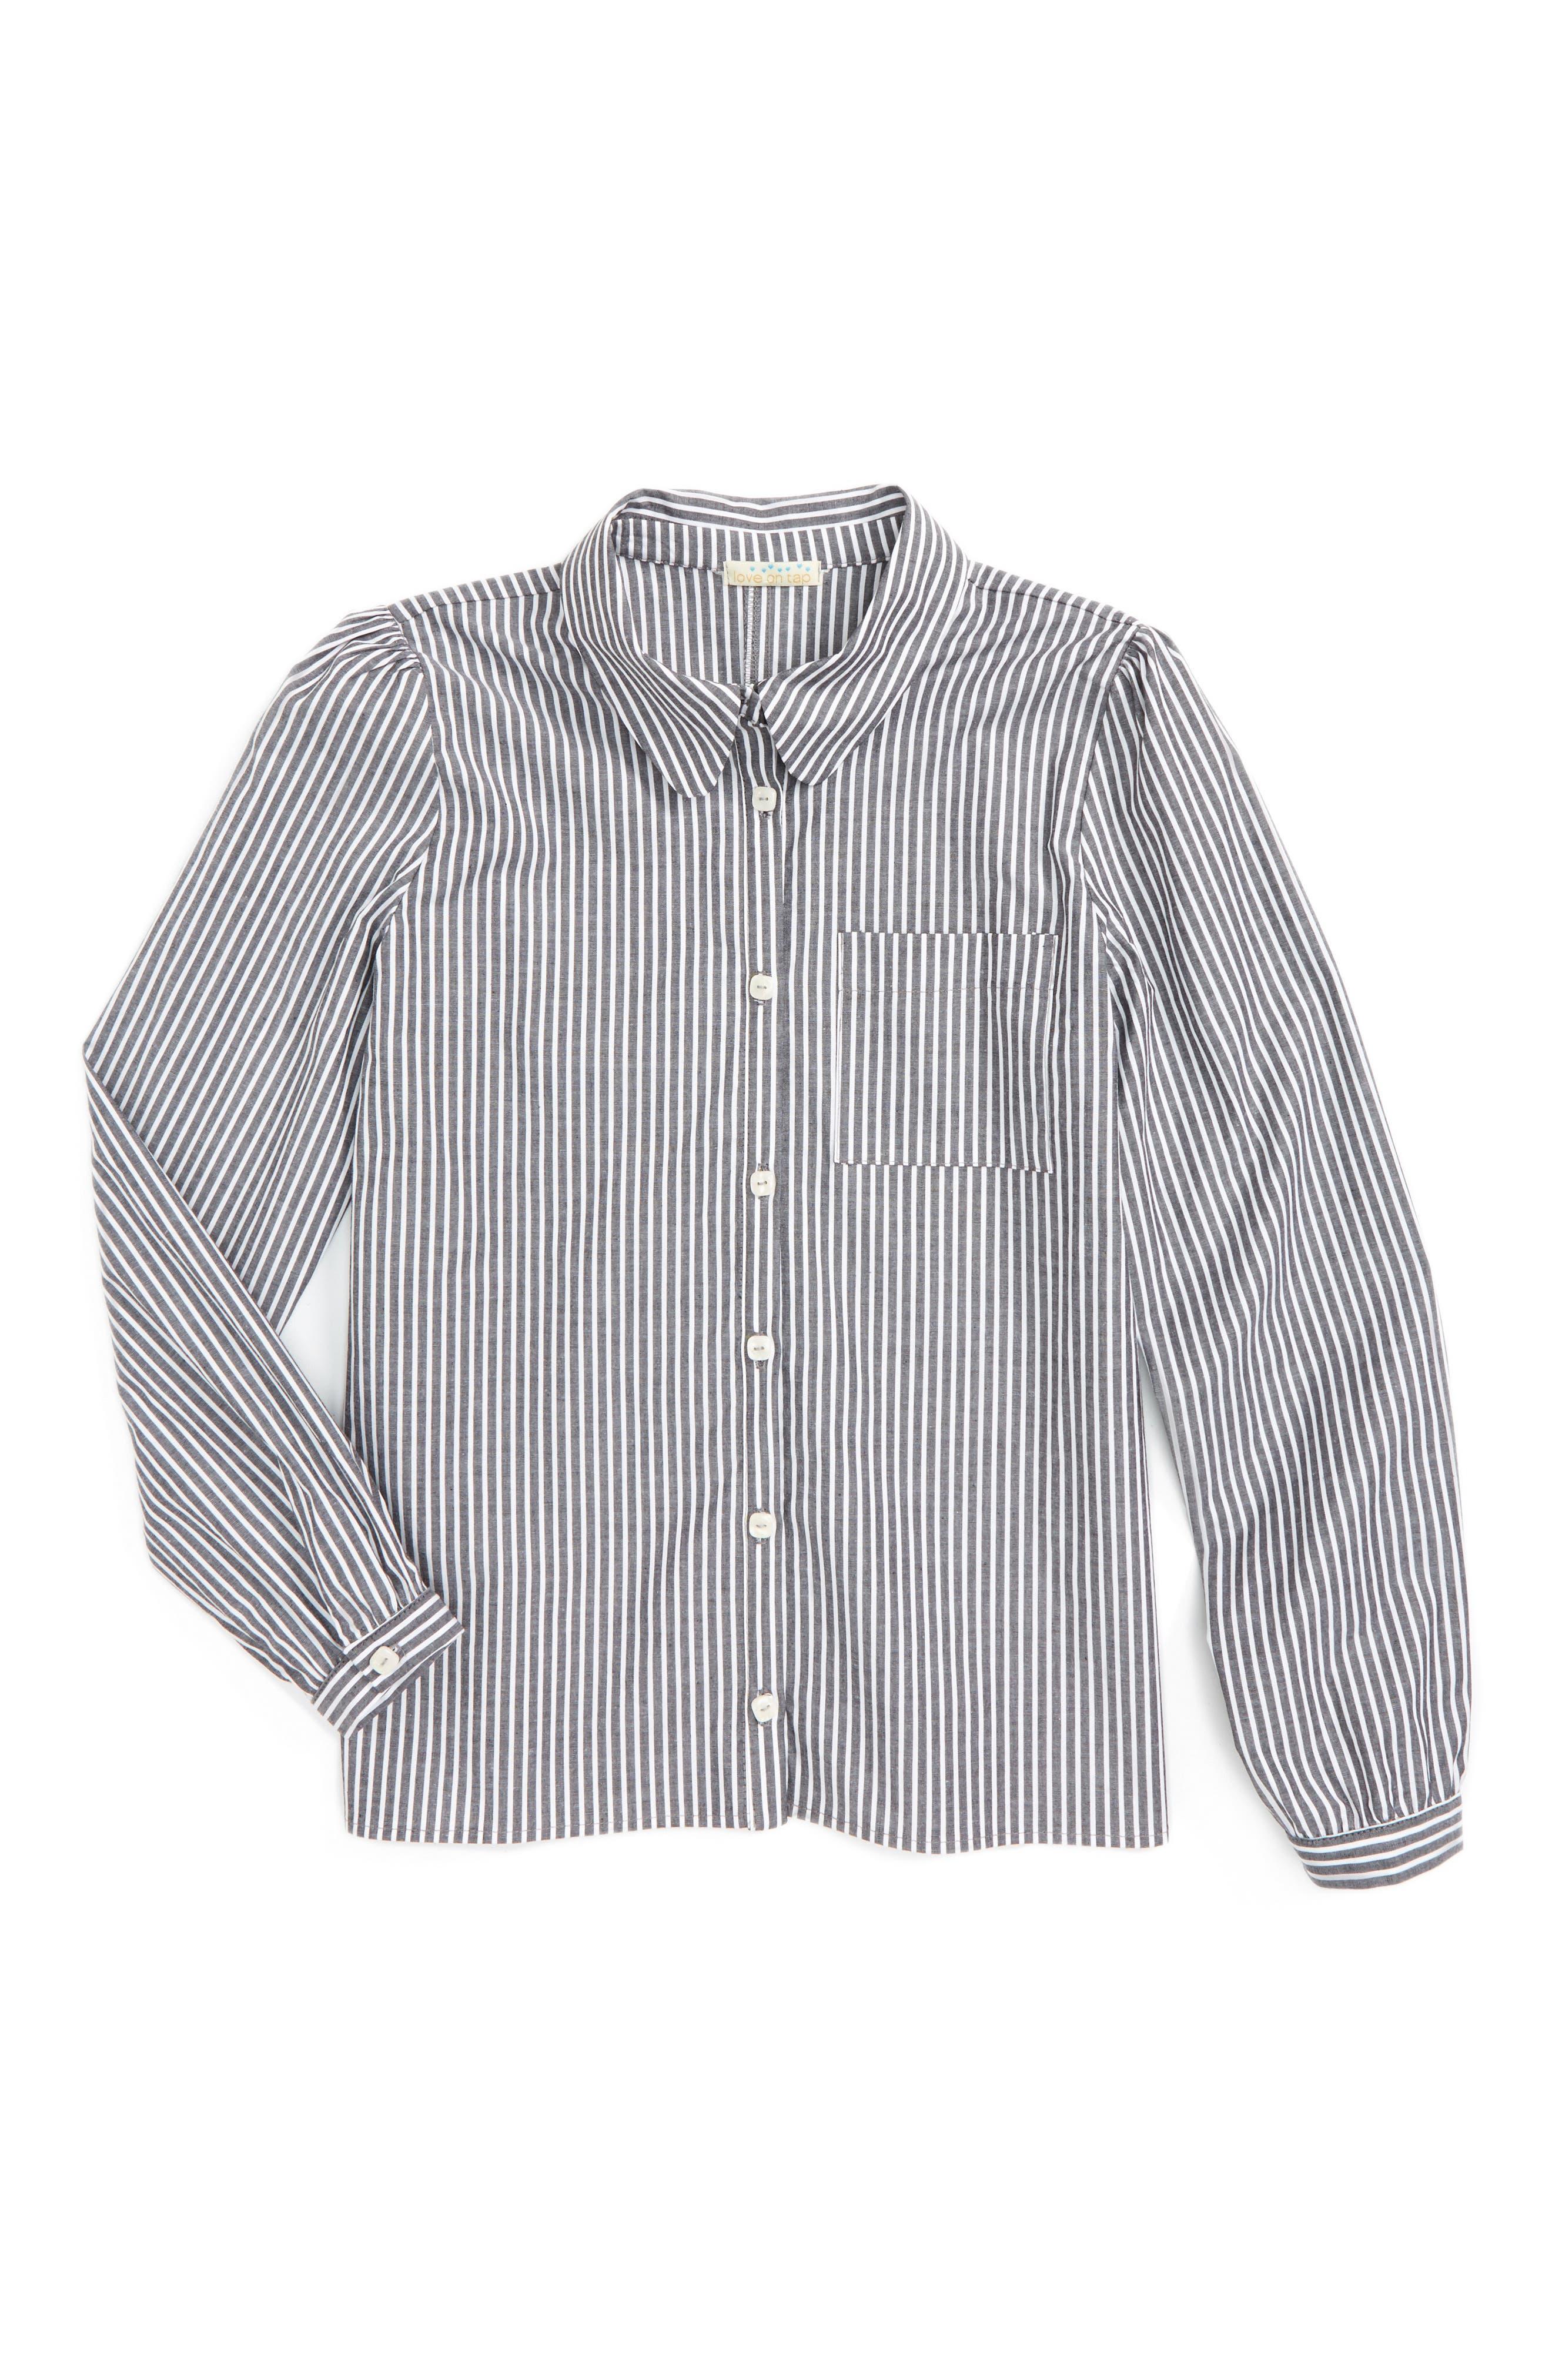 LOVE ON TAP Stripe Stretch Cotton Shirt